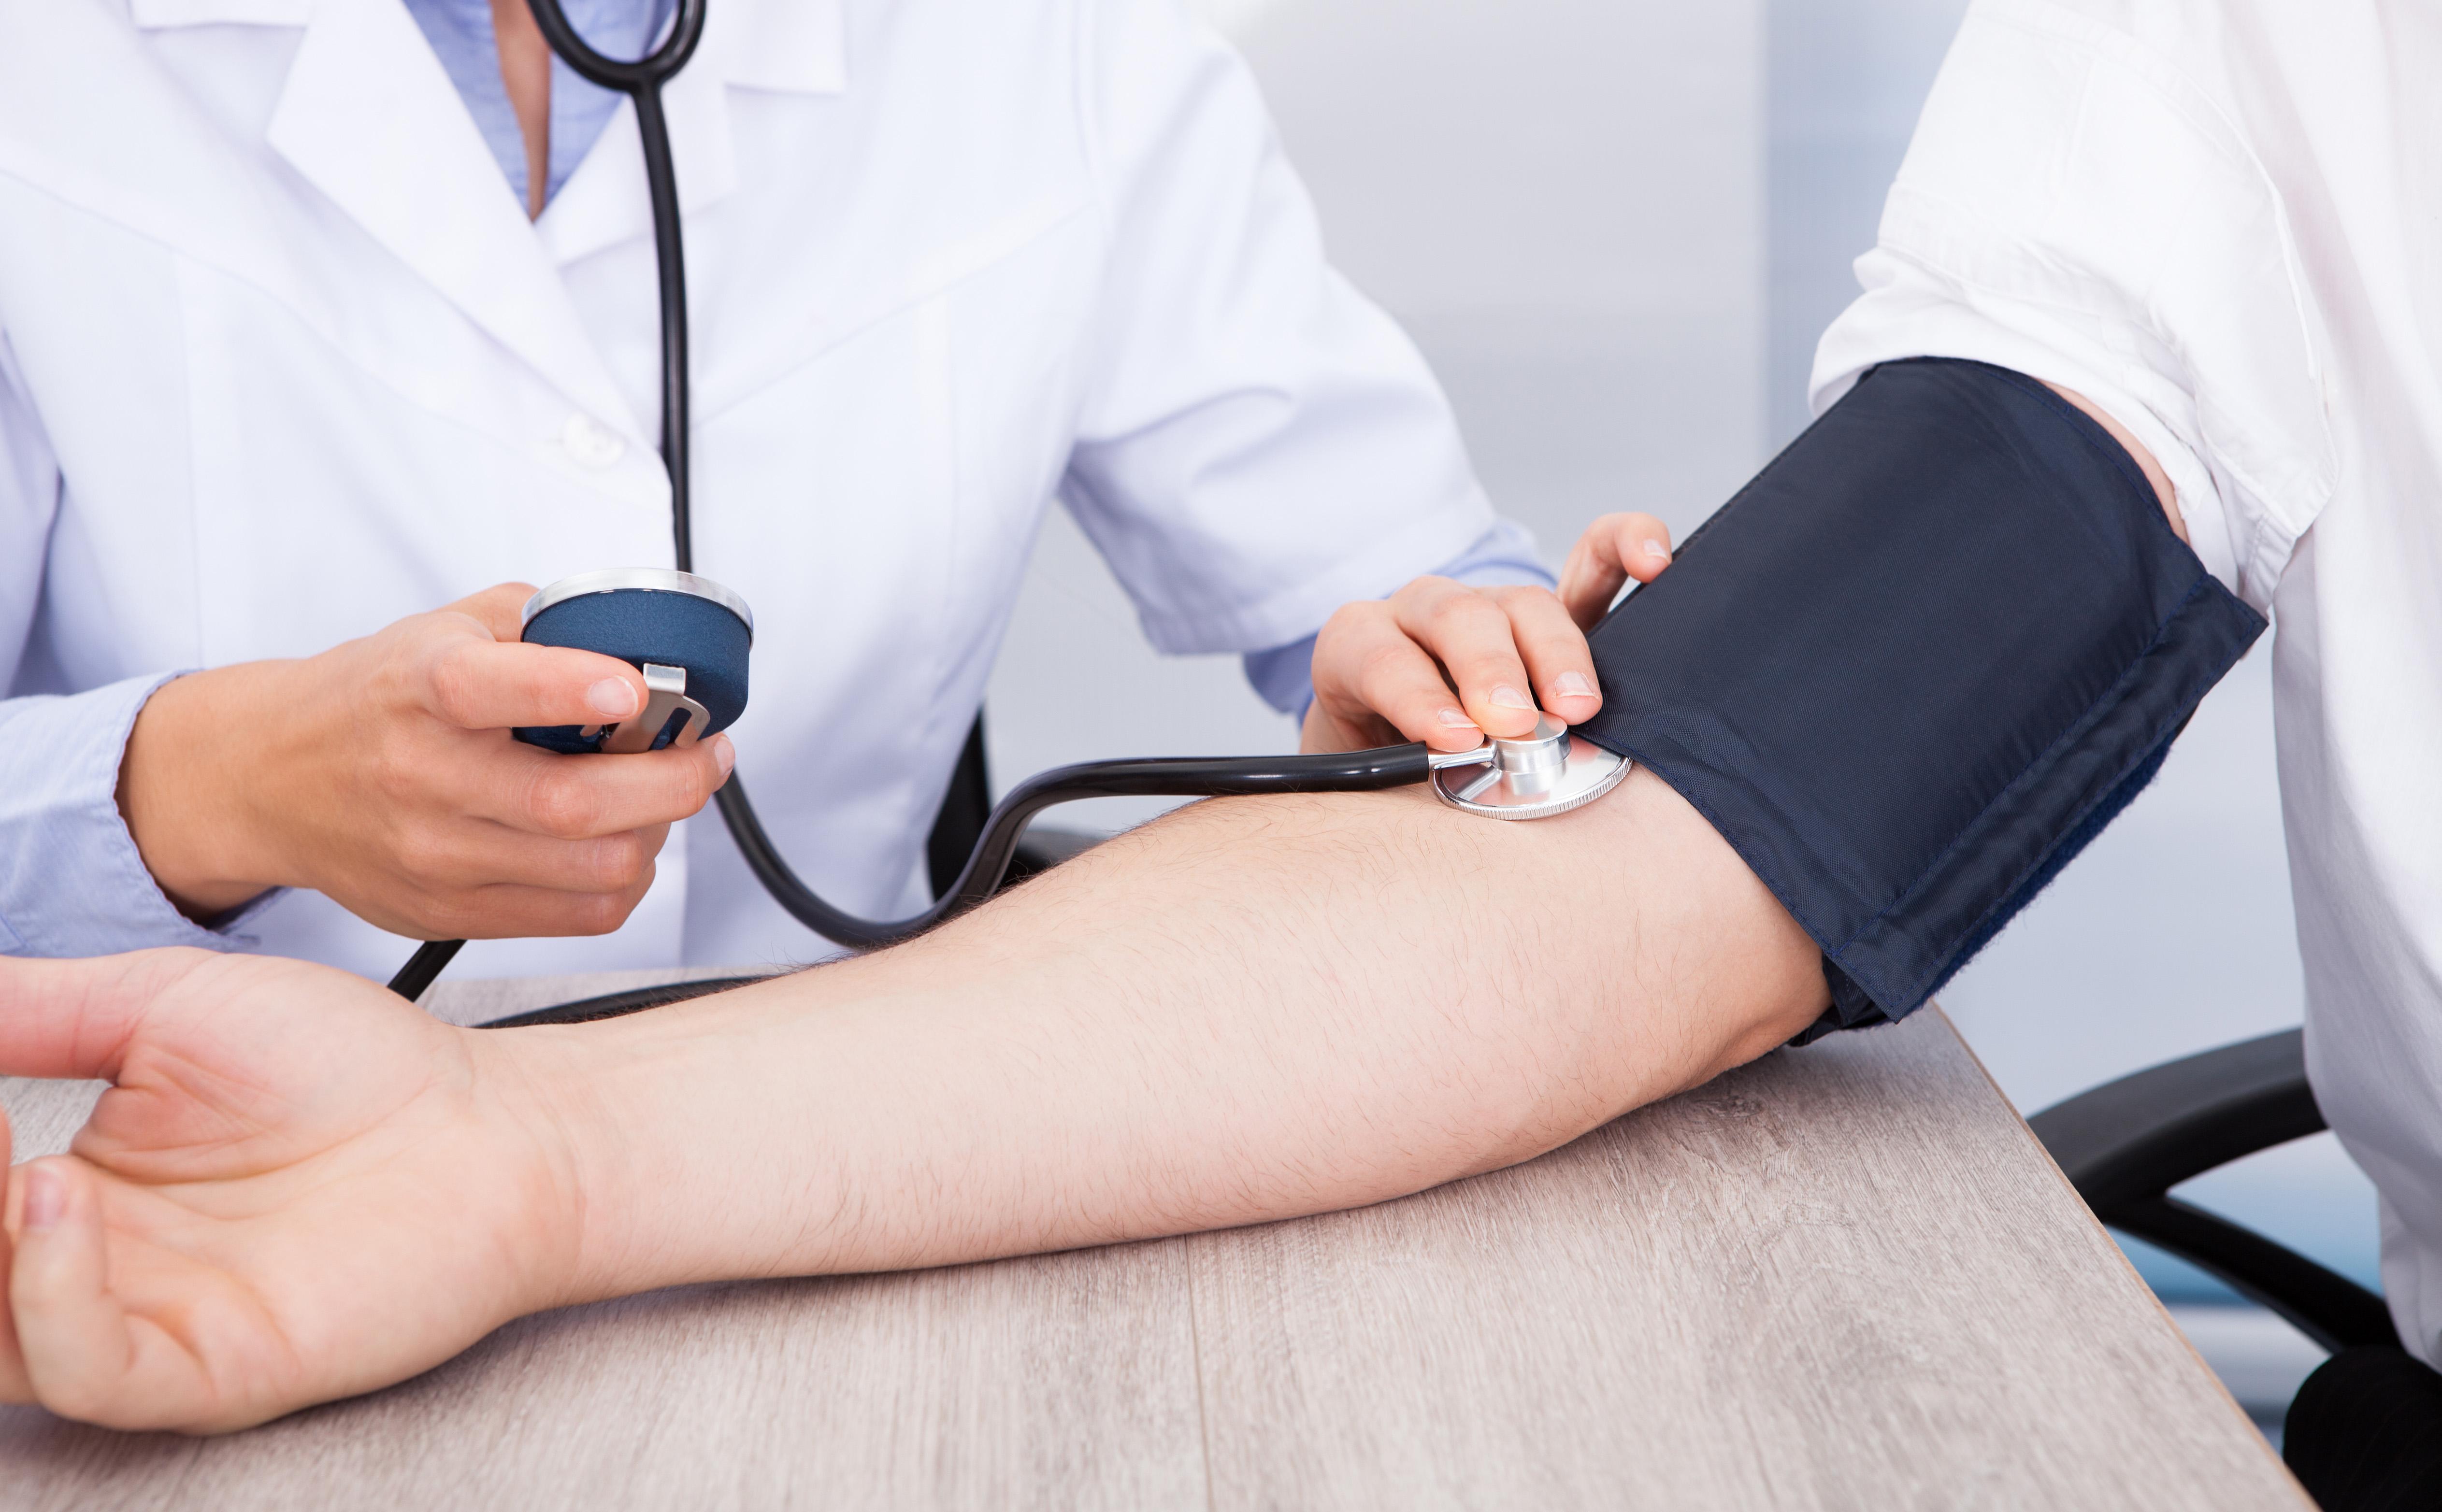 mit ne igyon magas vérnyomás esetén